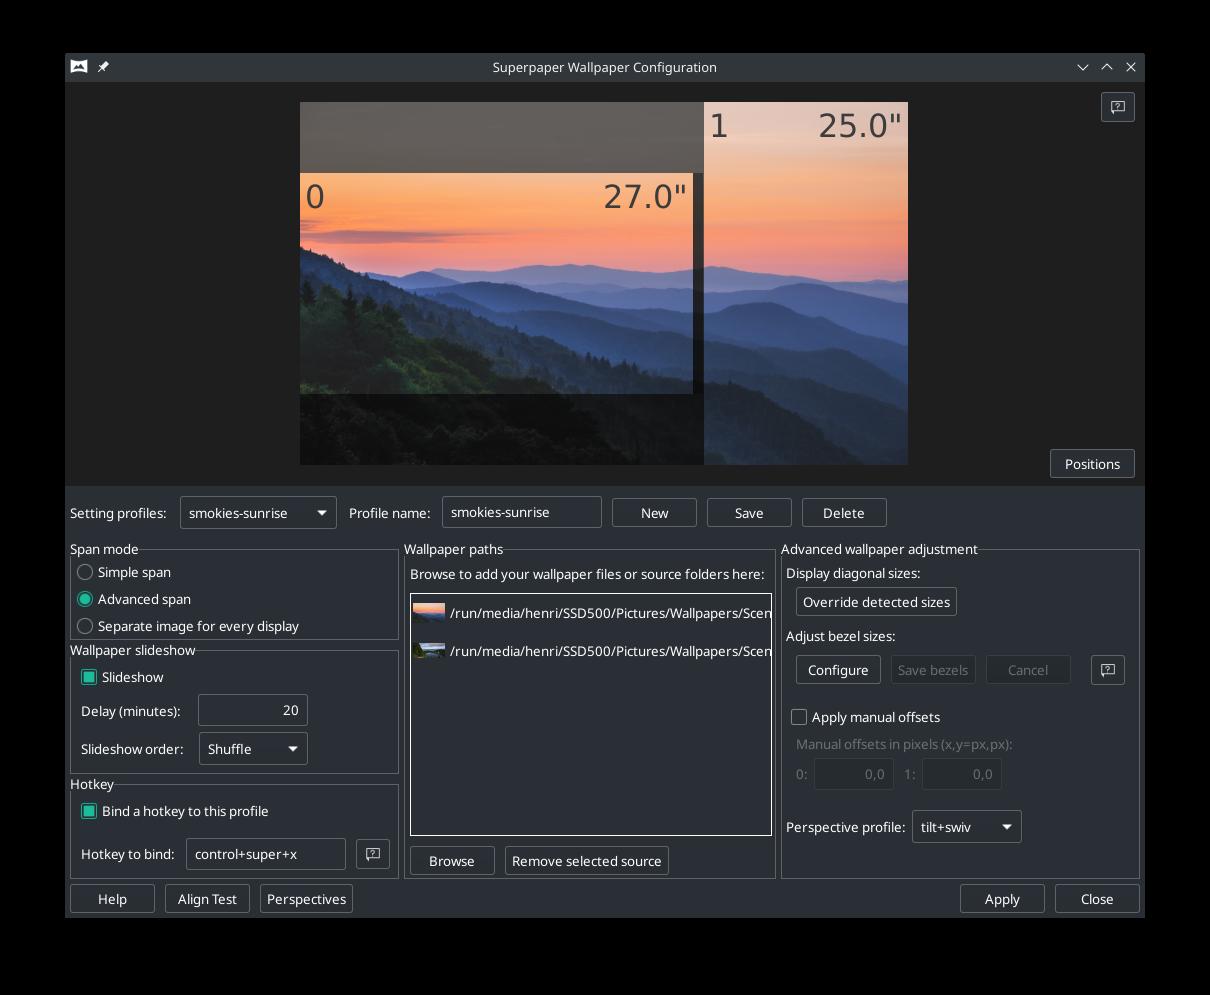 Superpaper, un administrador de fondos de pantalla con soporte para múltiples monitores   LiGNUx.com